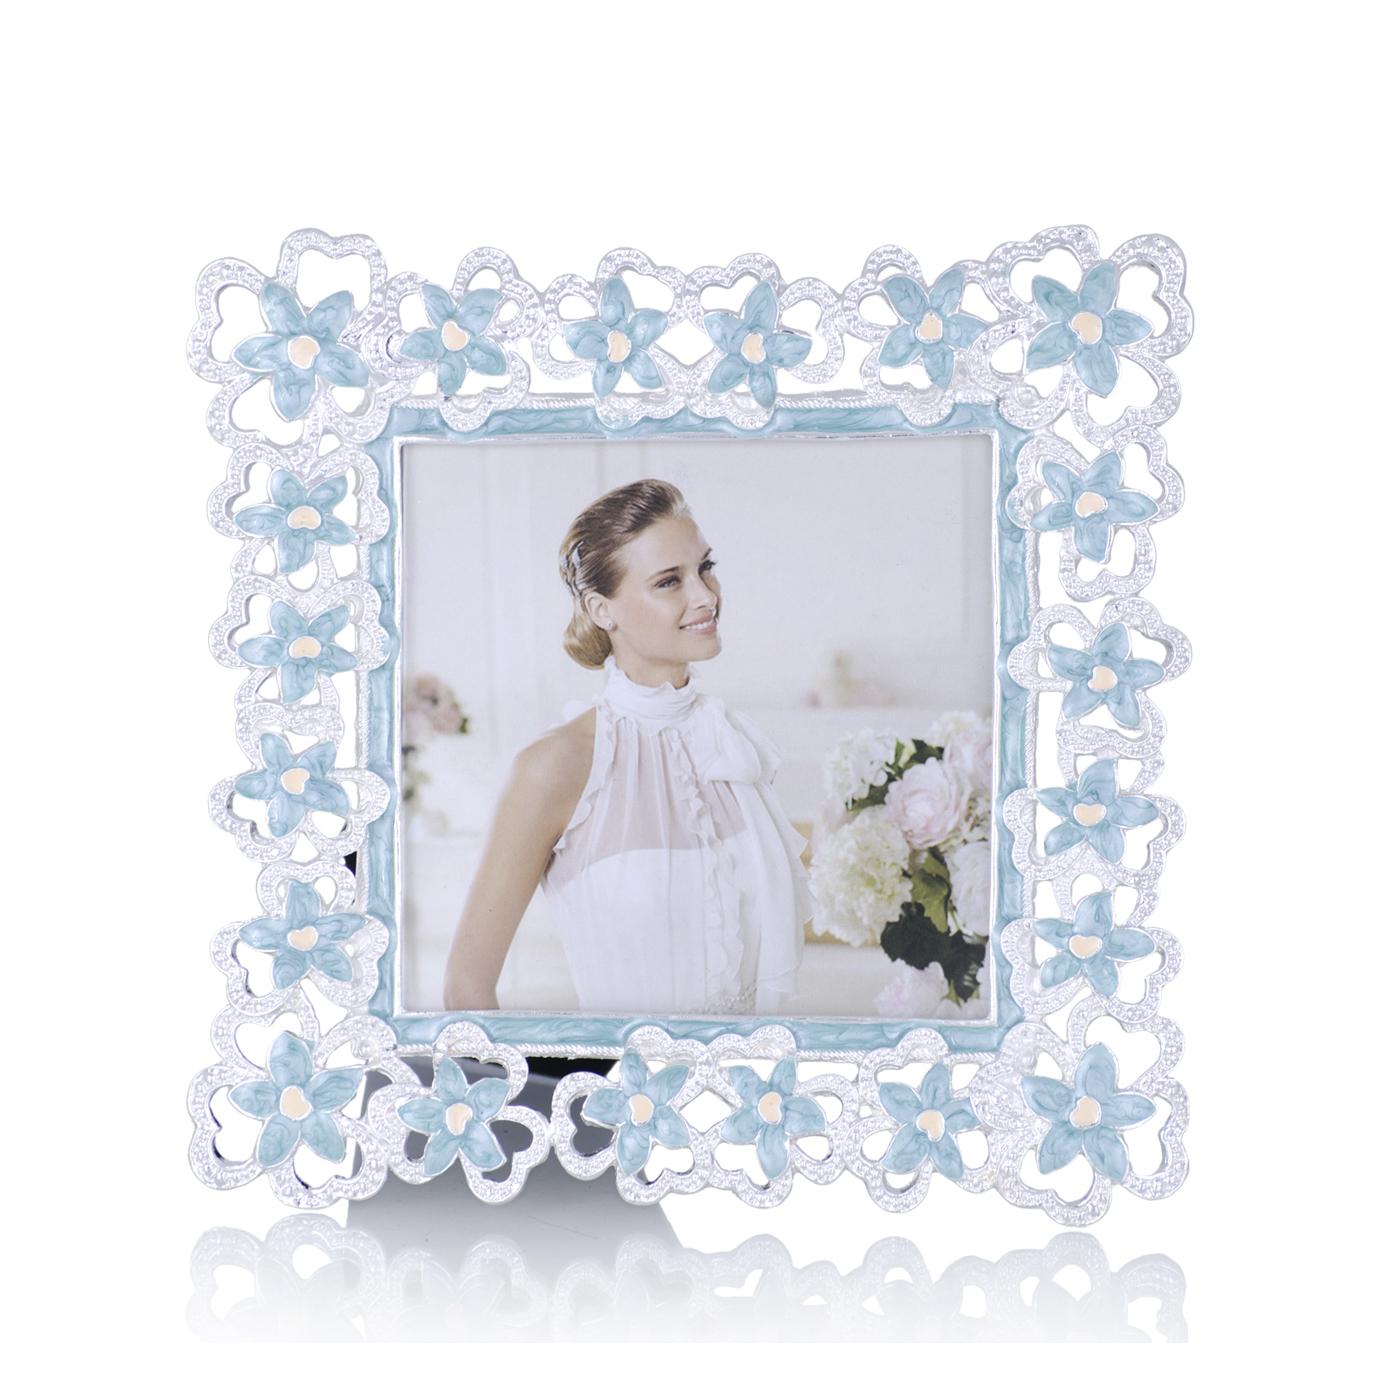 {} Home Philosophy Фоторамка Kleora (16х16 см) шкатулка фоторамка для ювелирных украшений moretto 18 x 13 x 5 см 39867